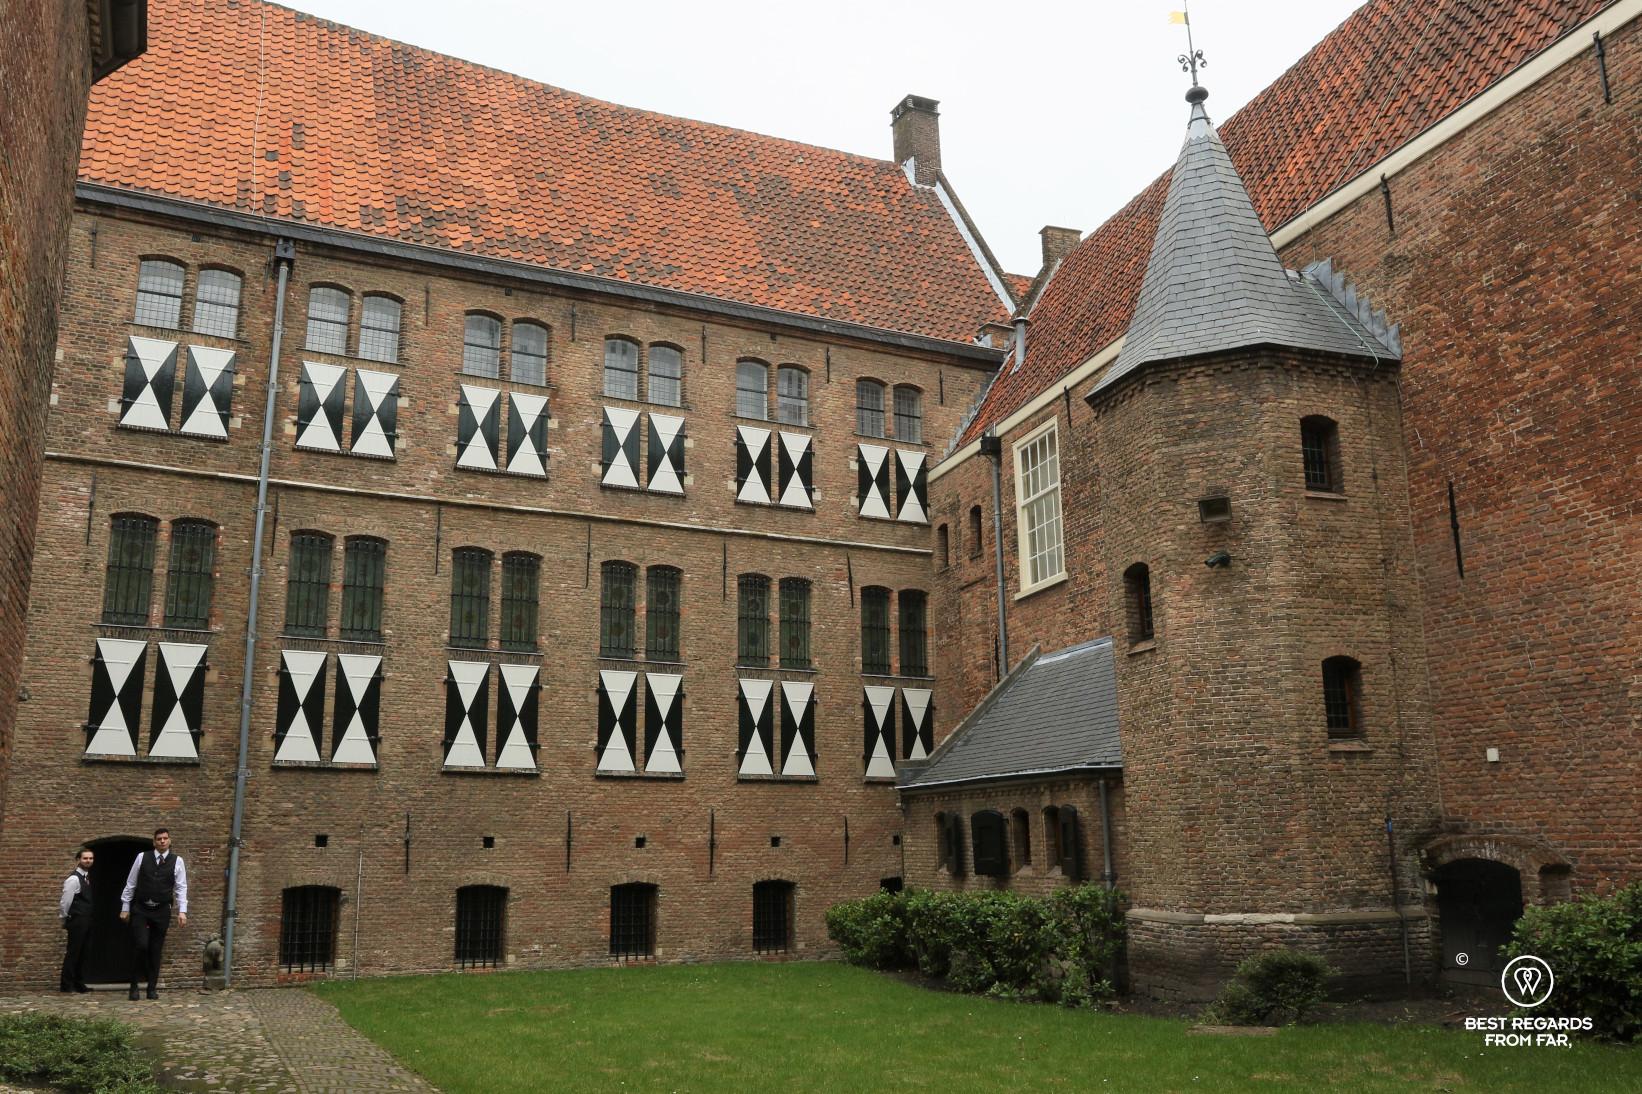 The prinsenhof, Delft